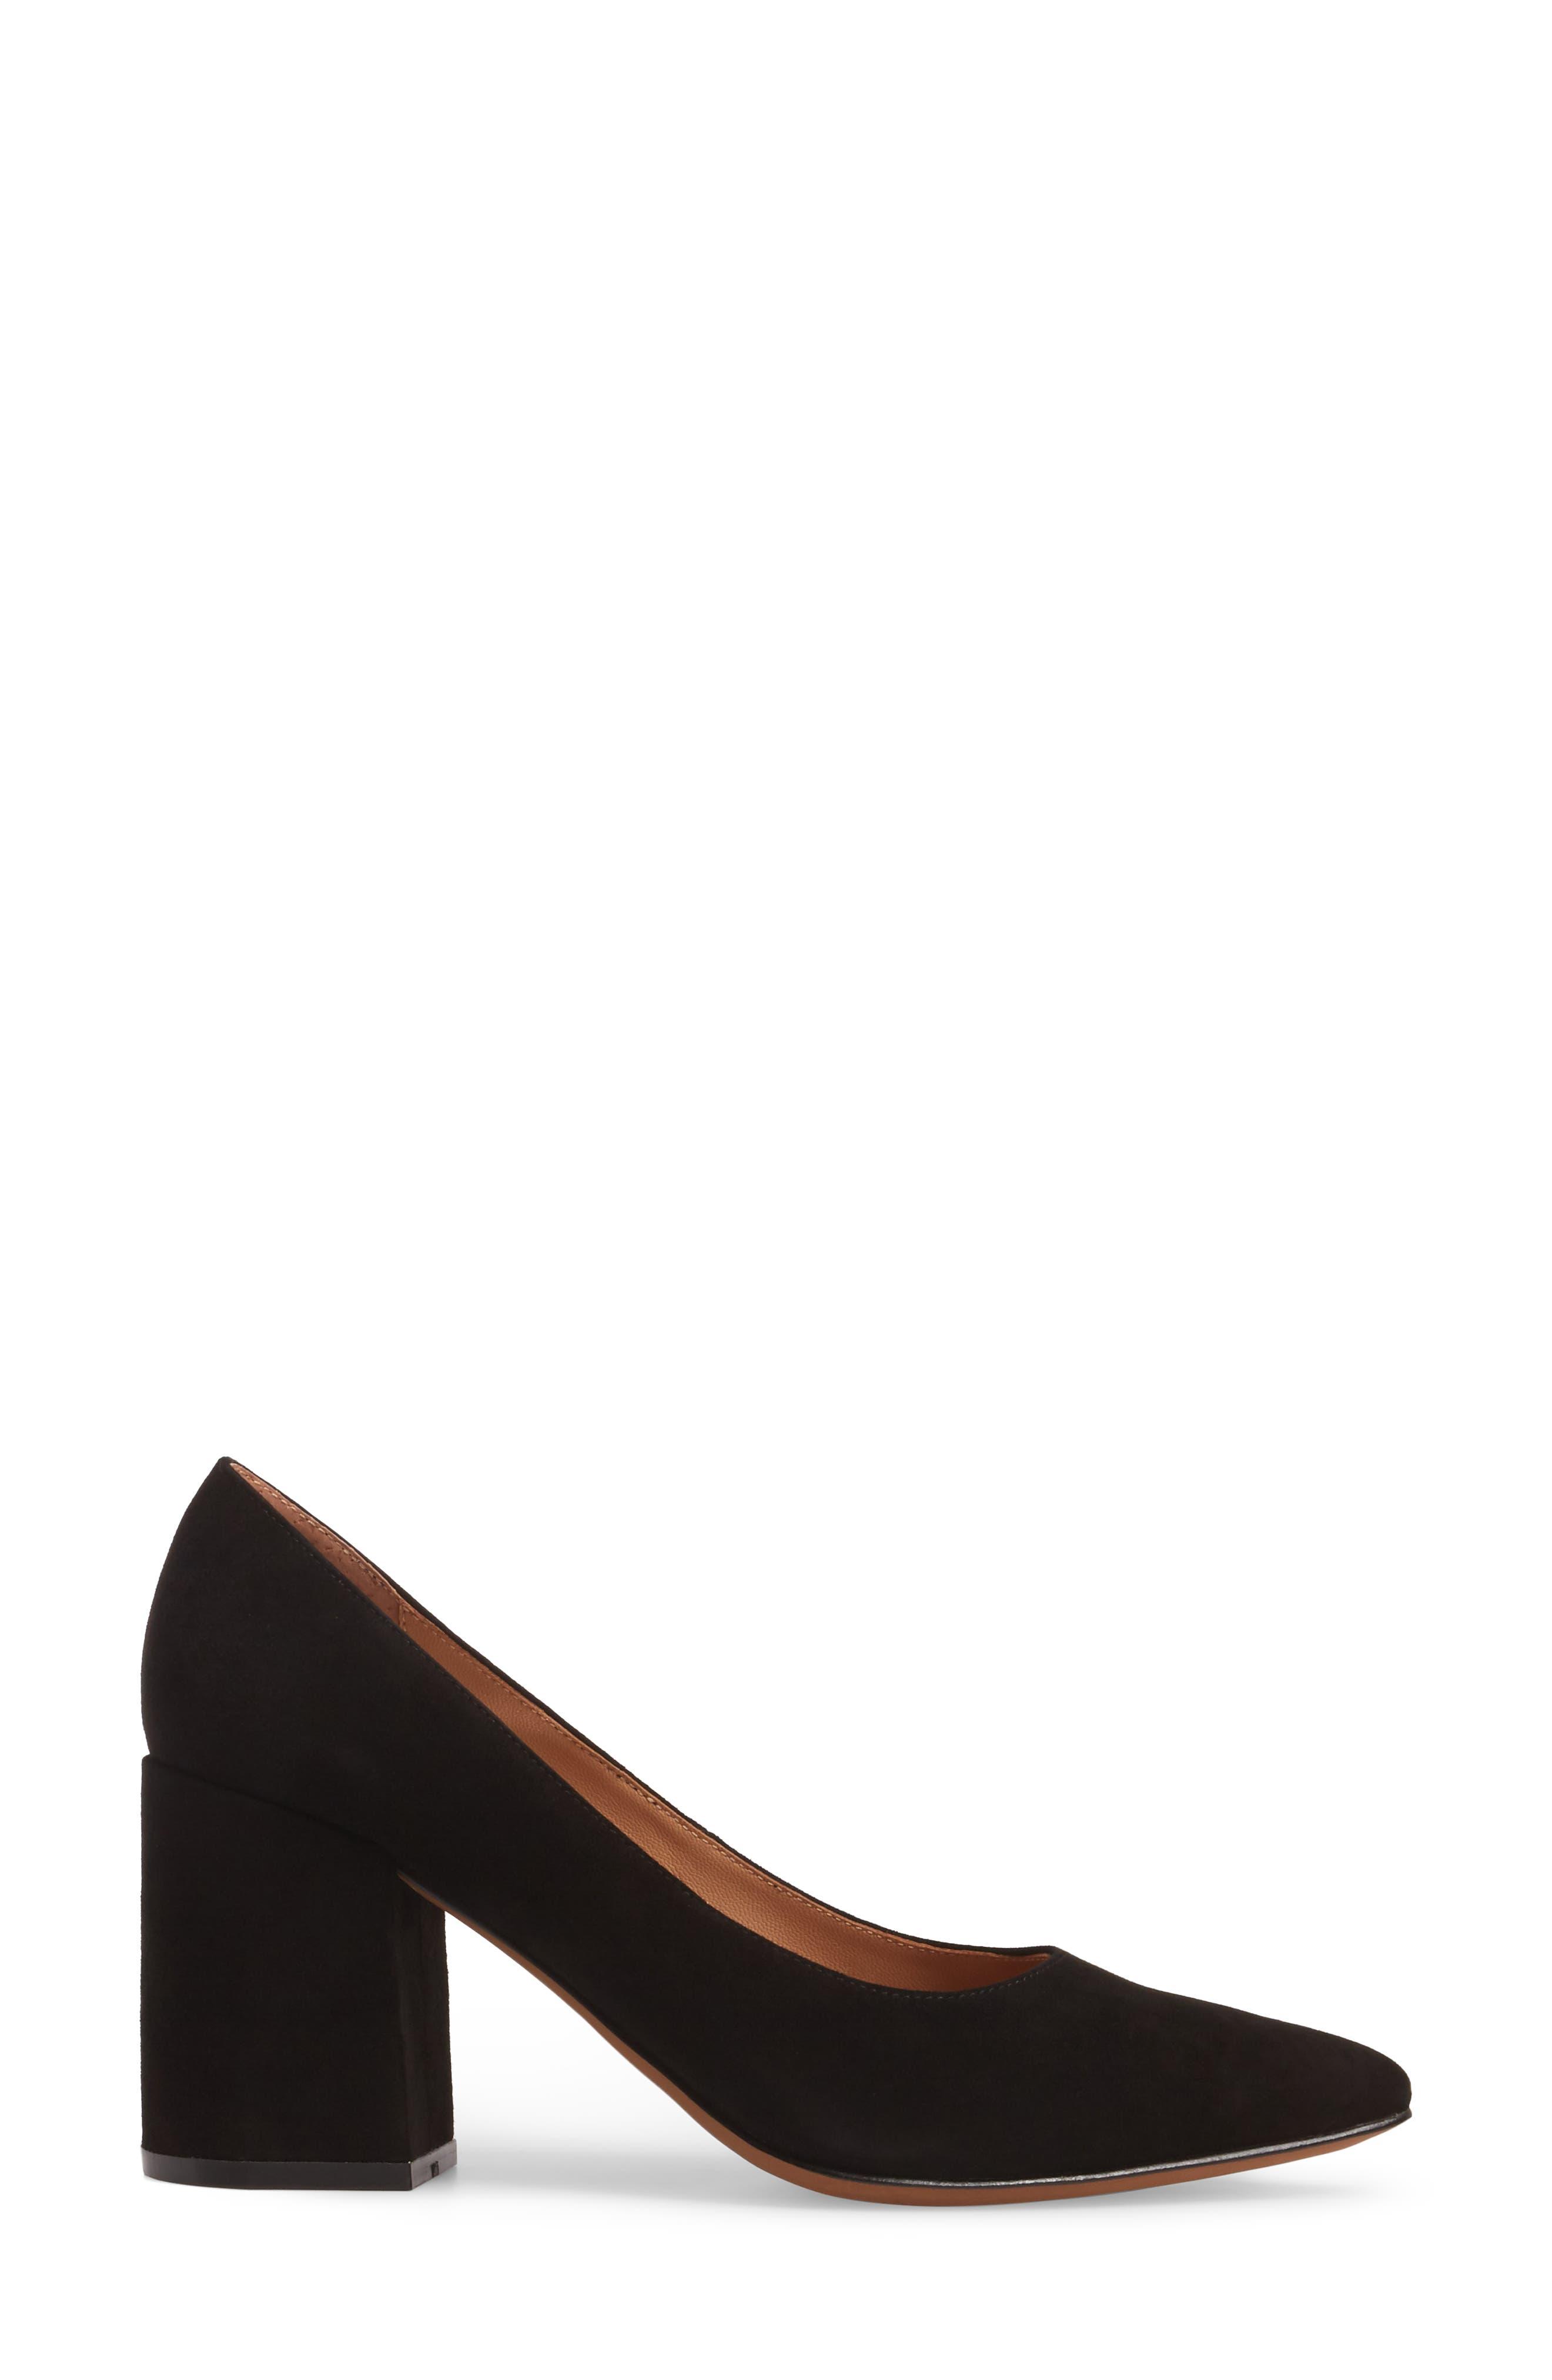 Blair Block Heel Pump,                             Alternate thumbnail 3, color,                             BLACK SUEDE